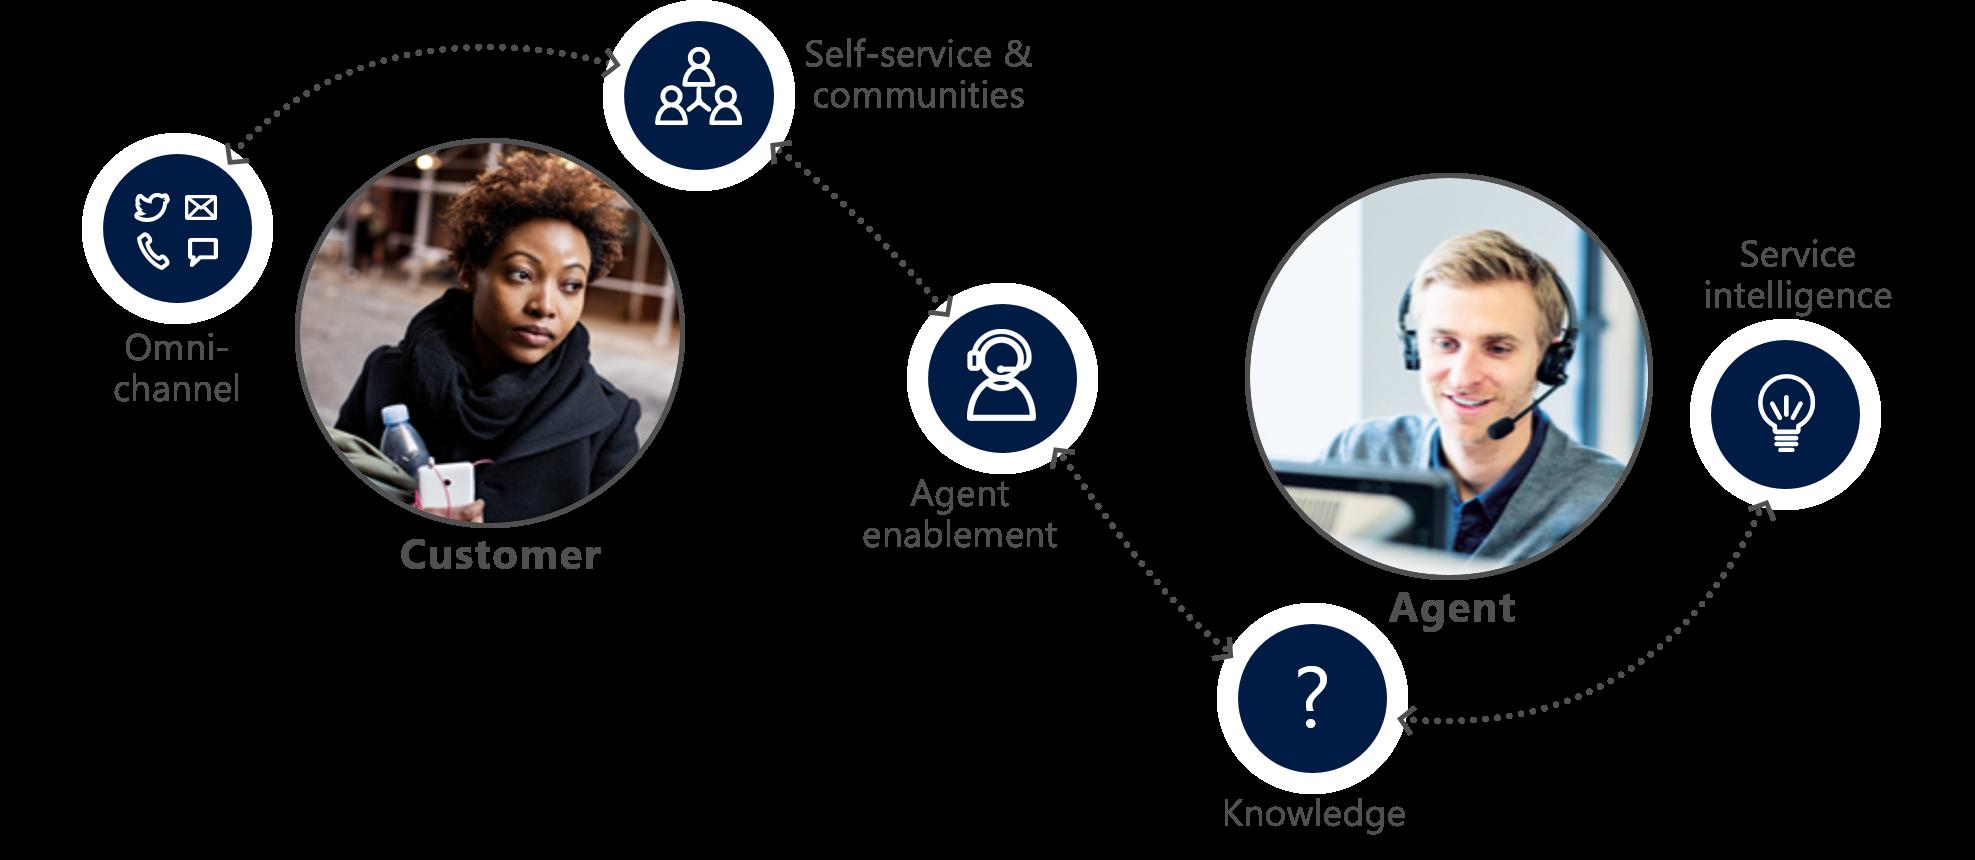 microsoft-dynamics-365-customer-service-3.png